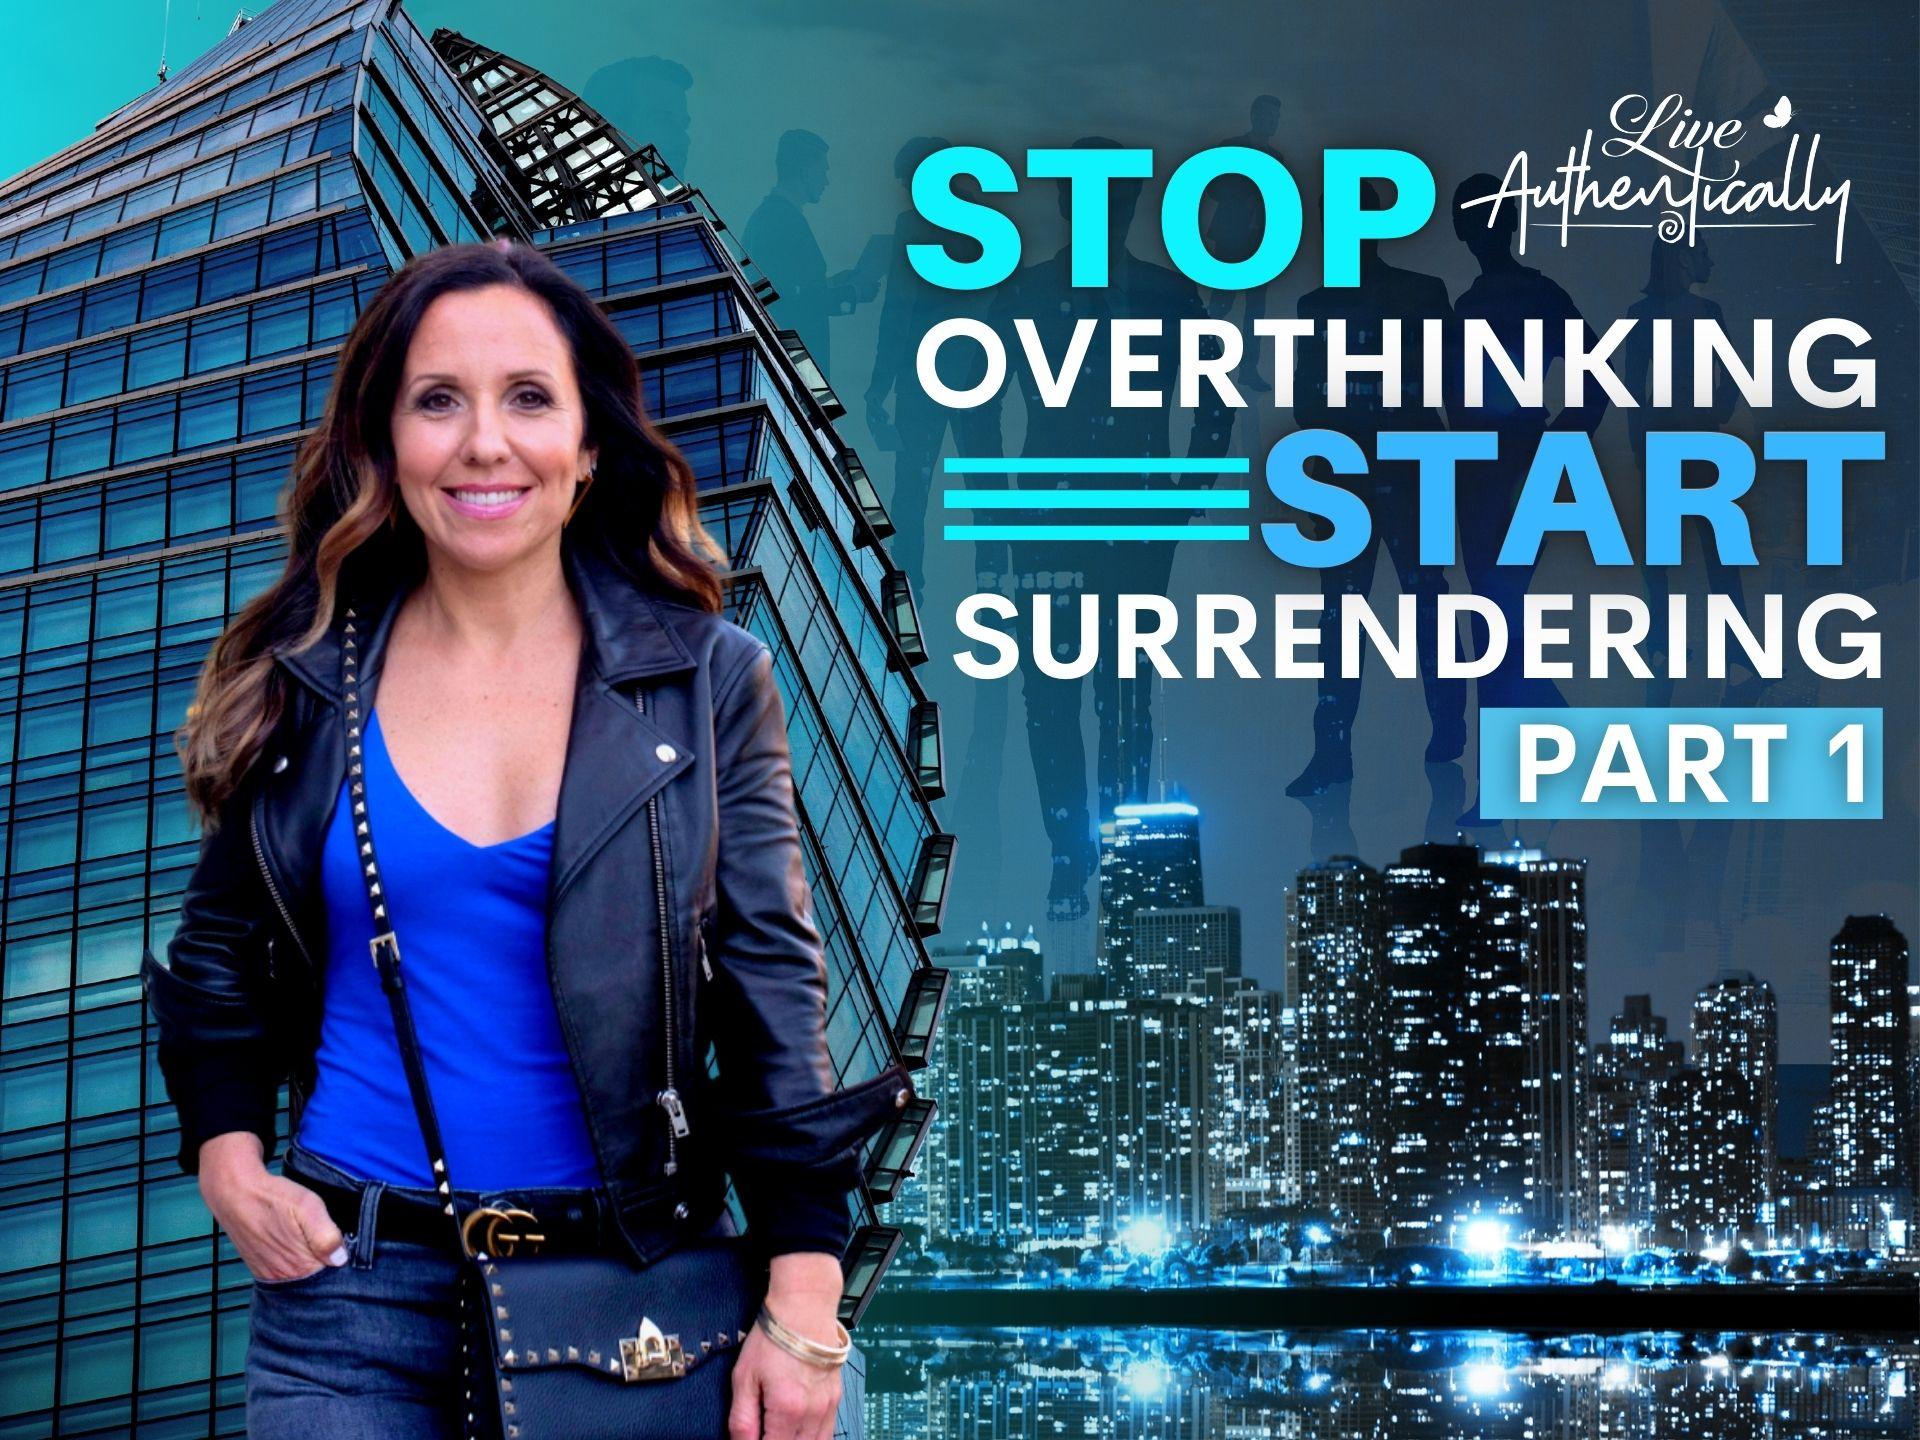 Stop Overthinking, Start Surrendering - Part 1